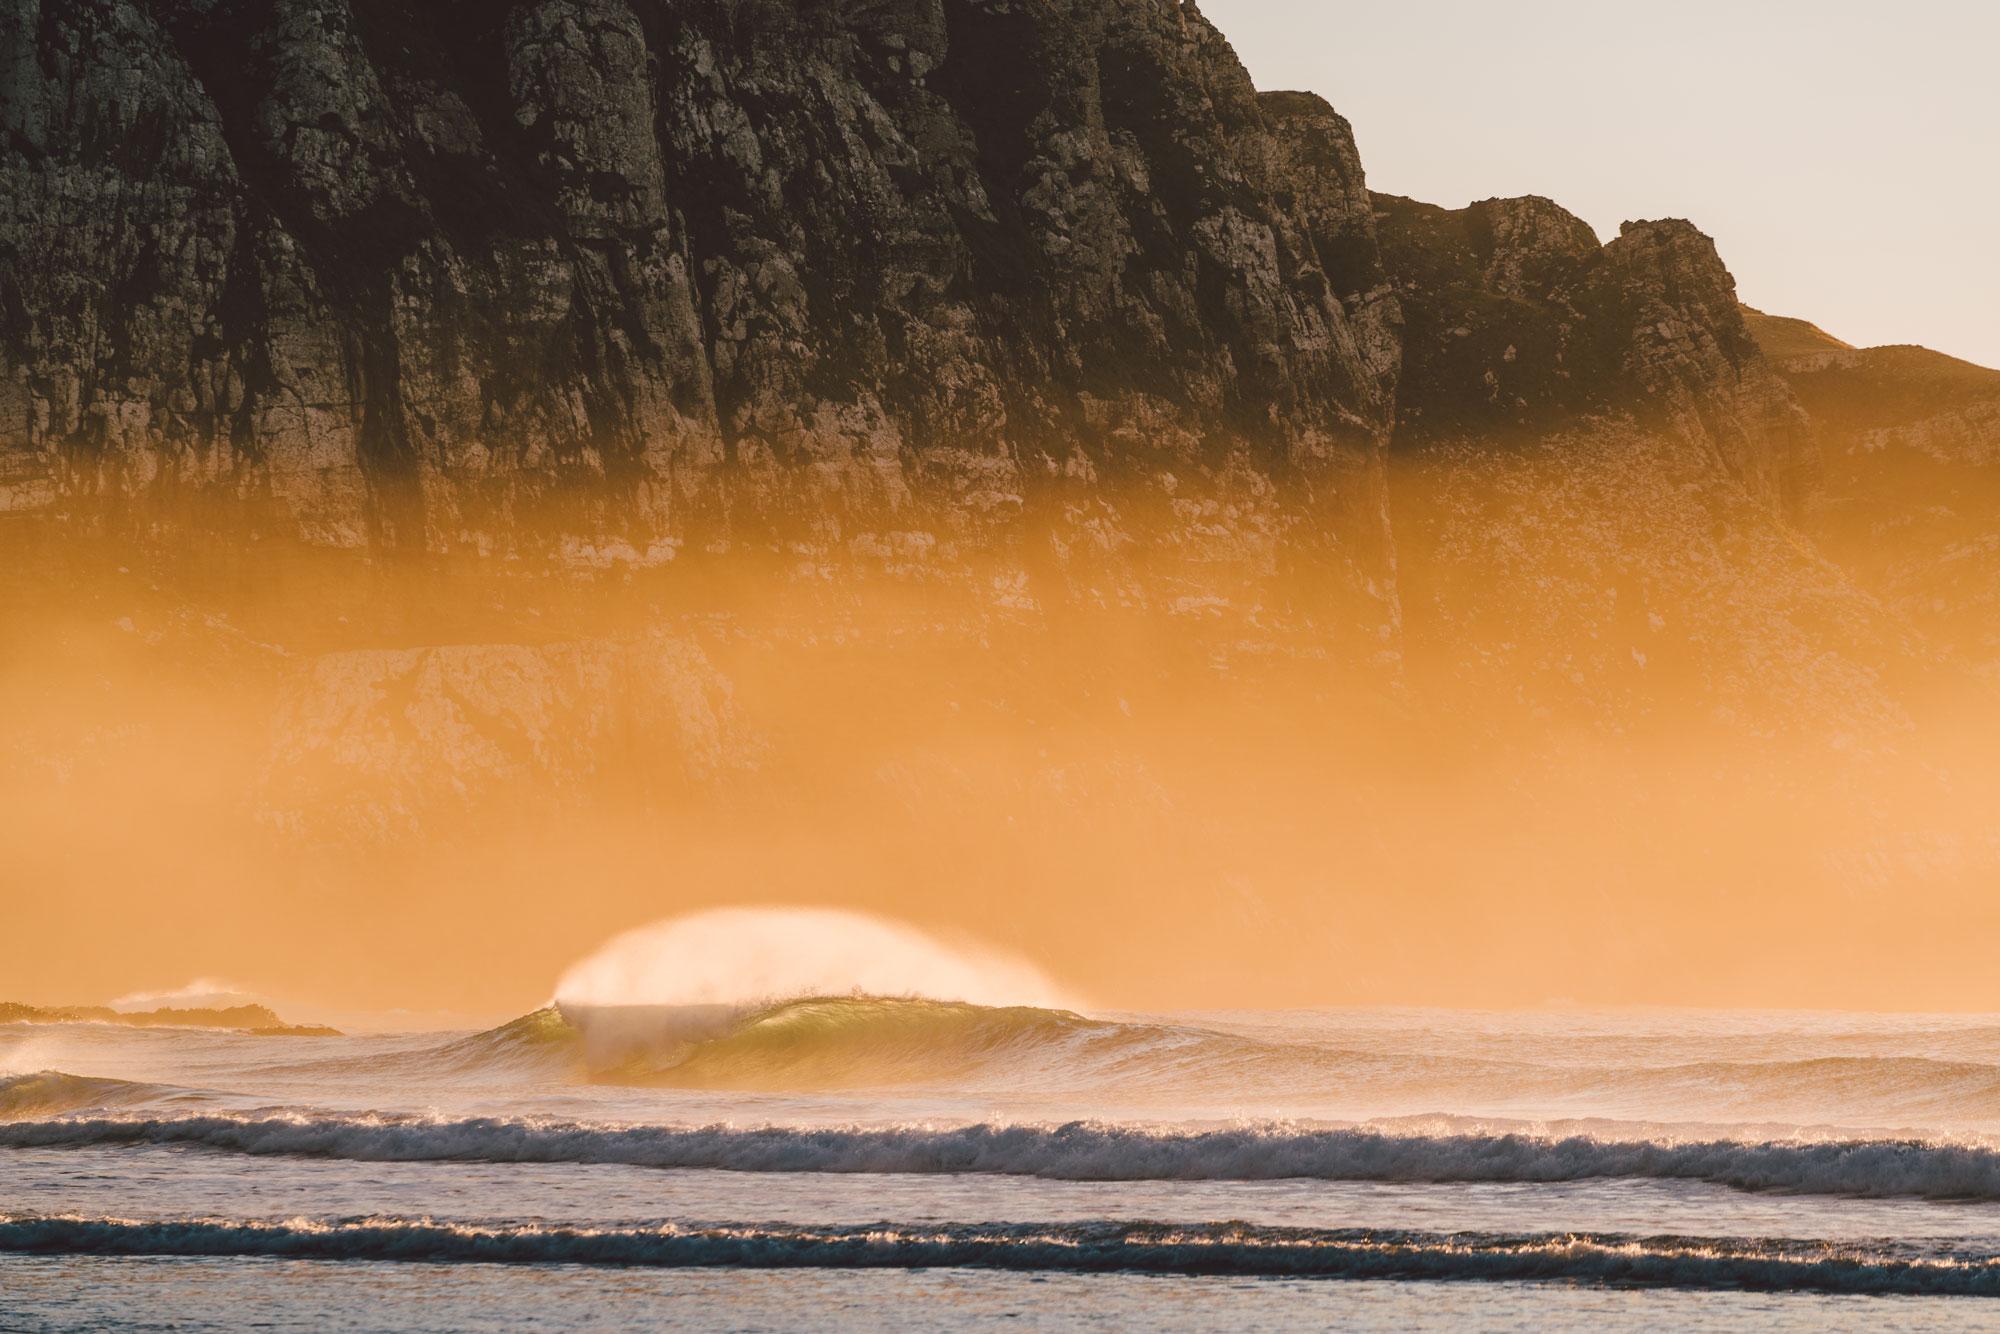 ©RomanKoenigshofer_NewZealand_Catlins_Wave_DSC00463